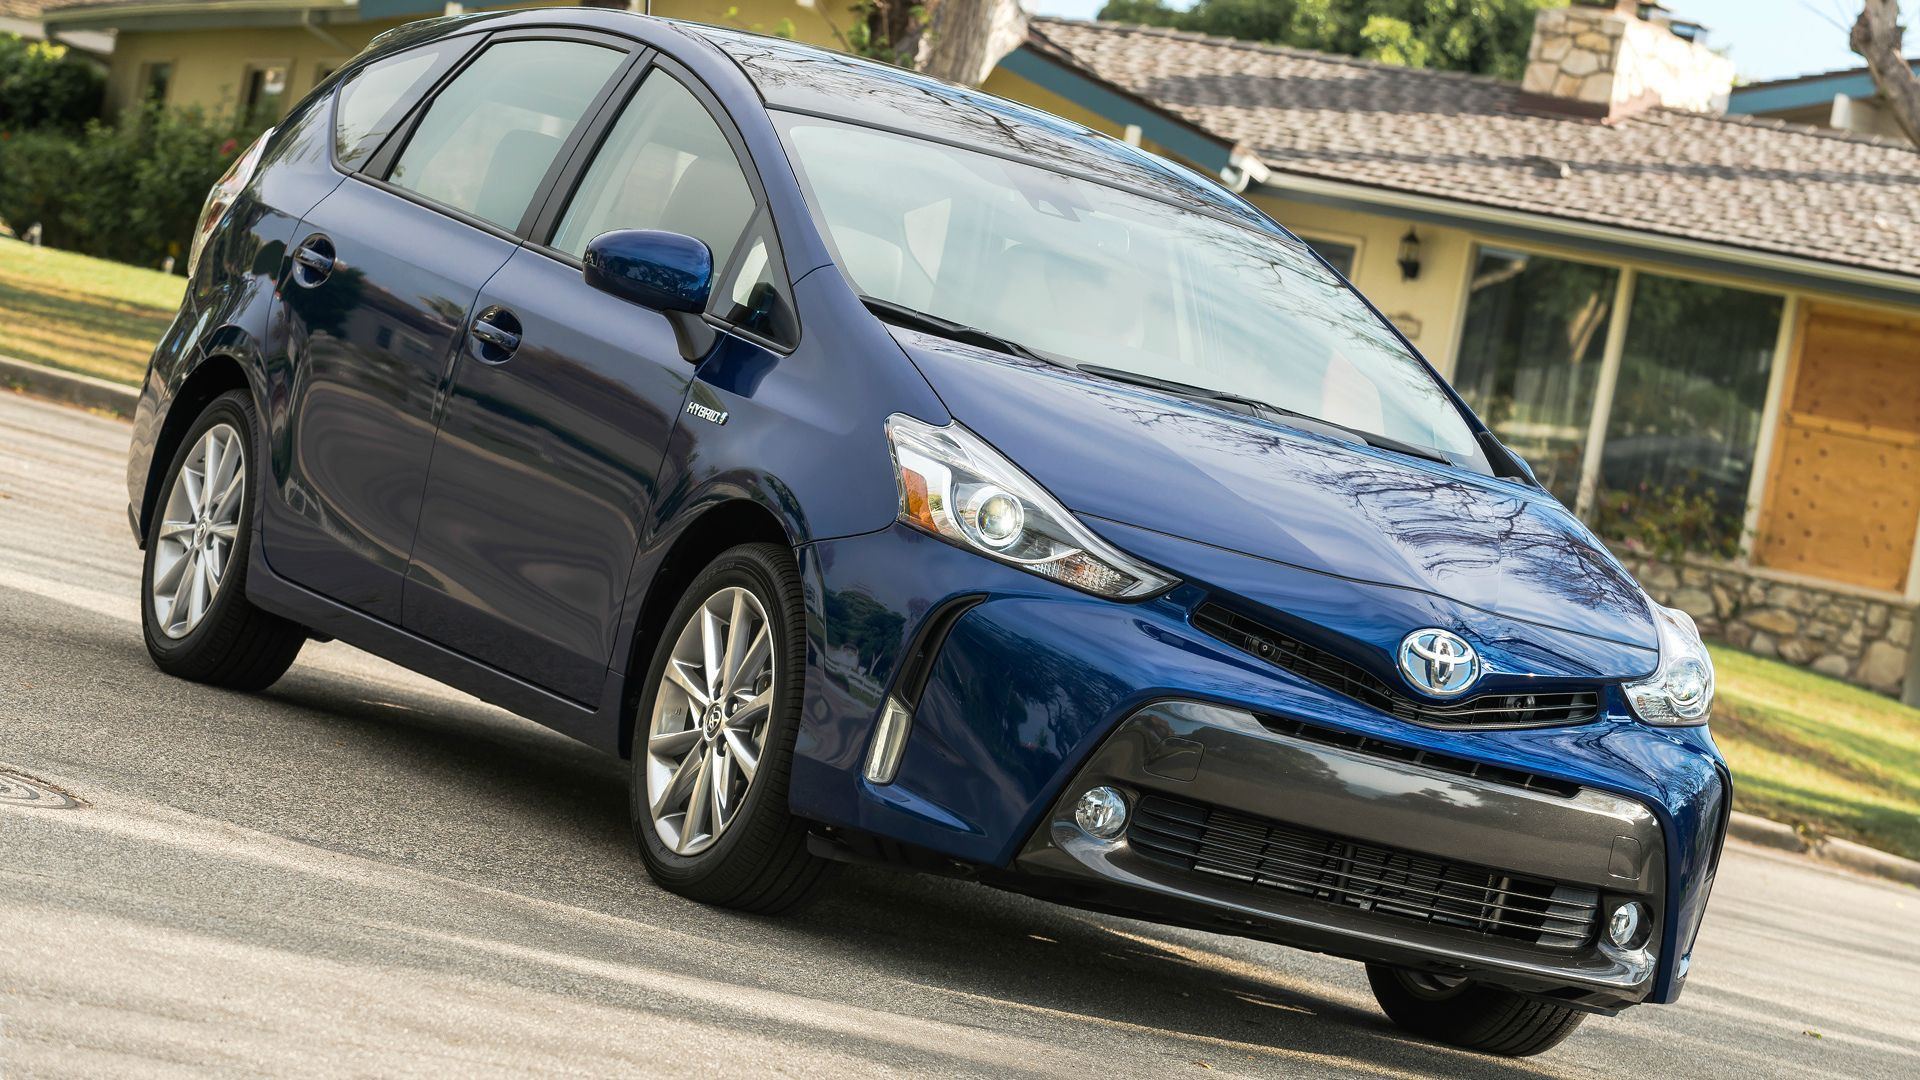 2019 Prius New 2019 Toyota Prius V Release Date Auto Blog1ub